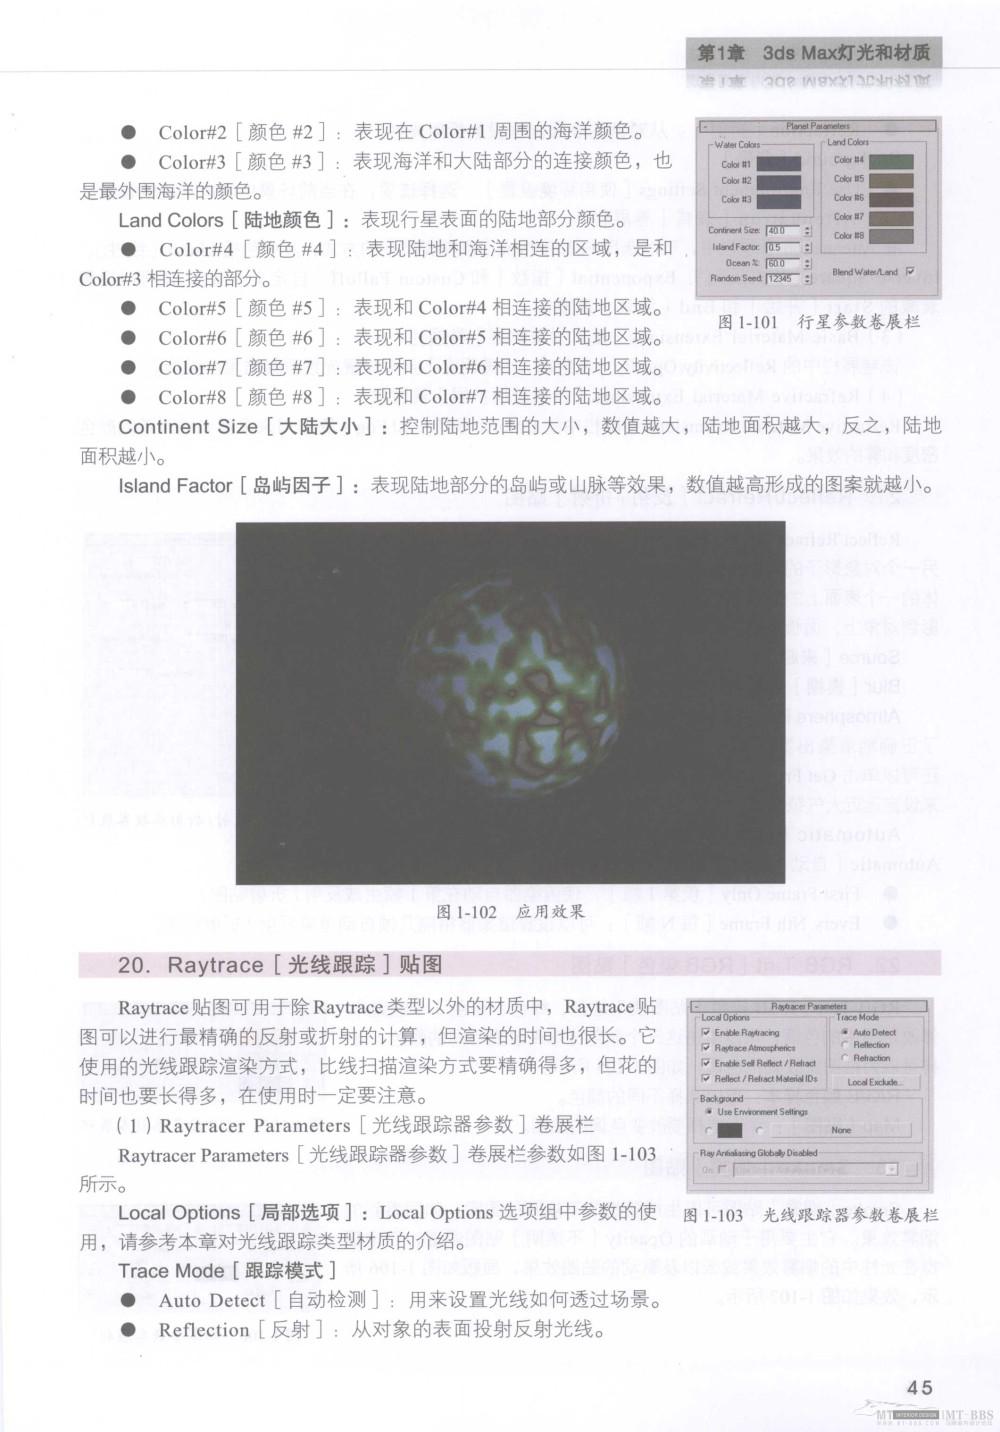 水晶石技法-3ds_Max&VRay室内空间表现_水晶石技法-3ds_Max&VRay室内空间表现_页面_051.jpg